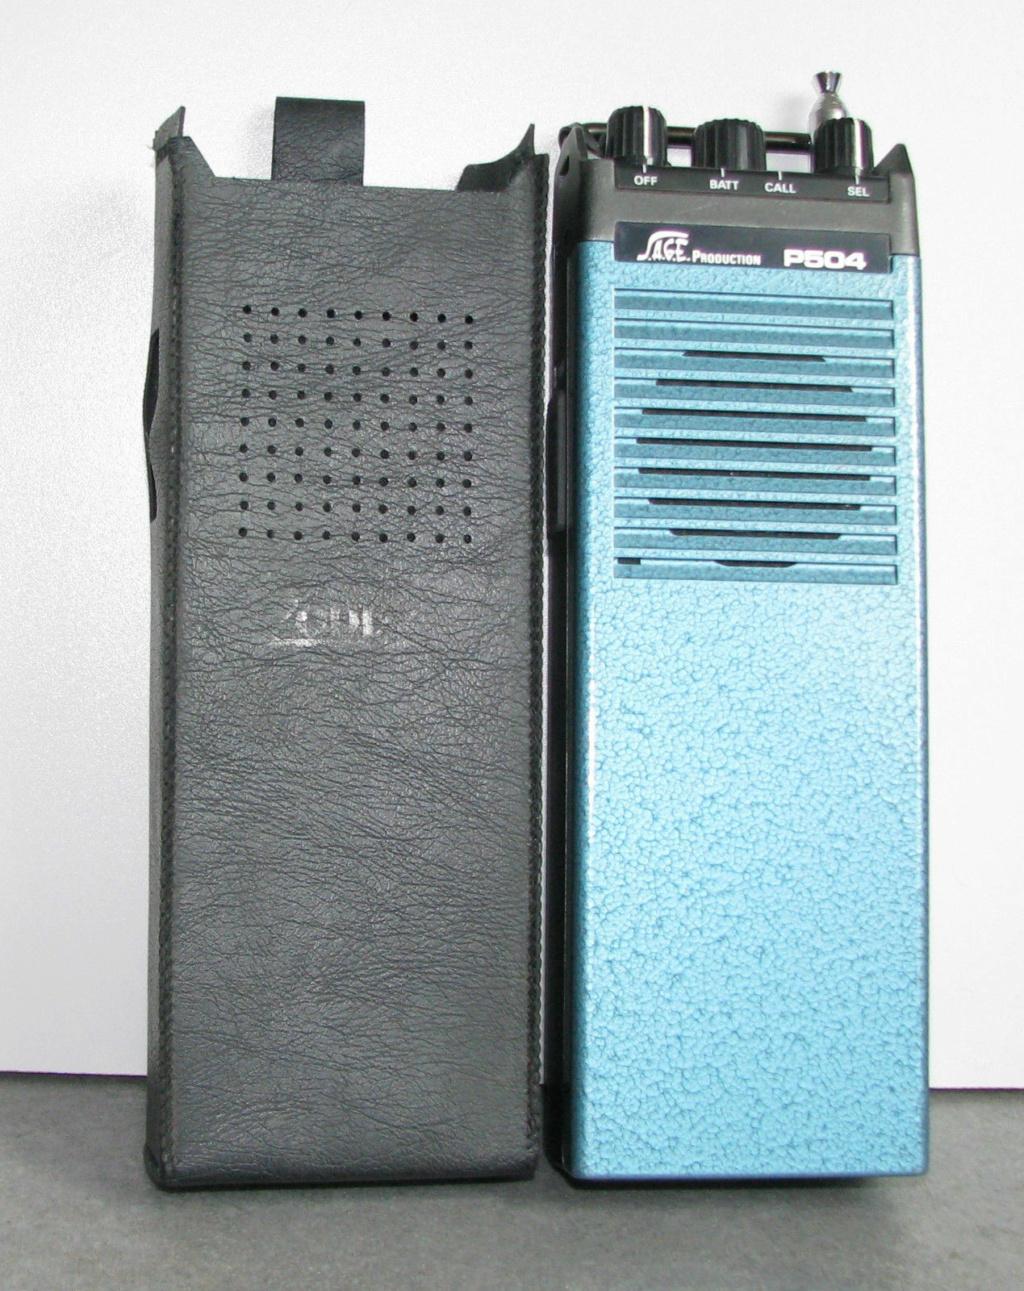 Cherche antenne ZODIAC P3006 S-l16051